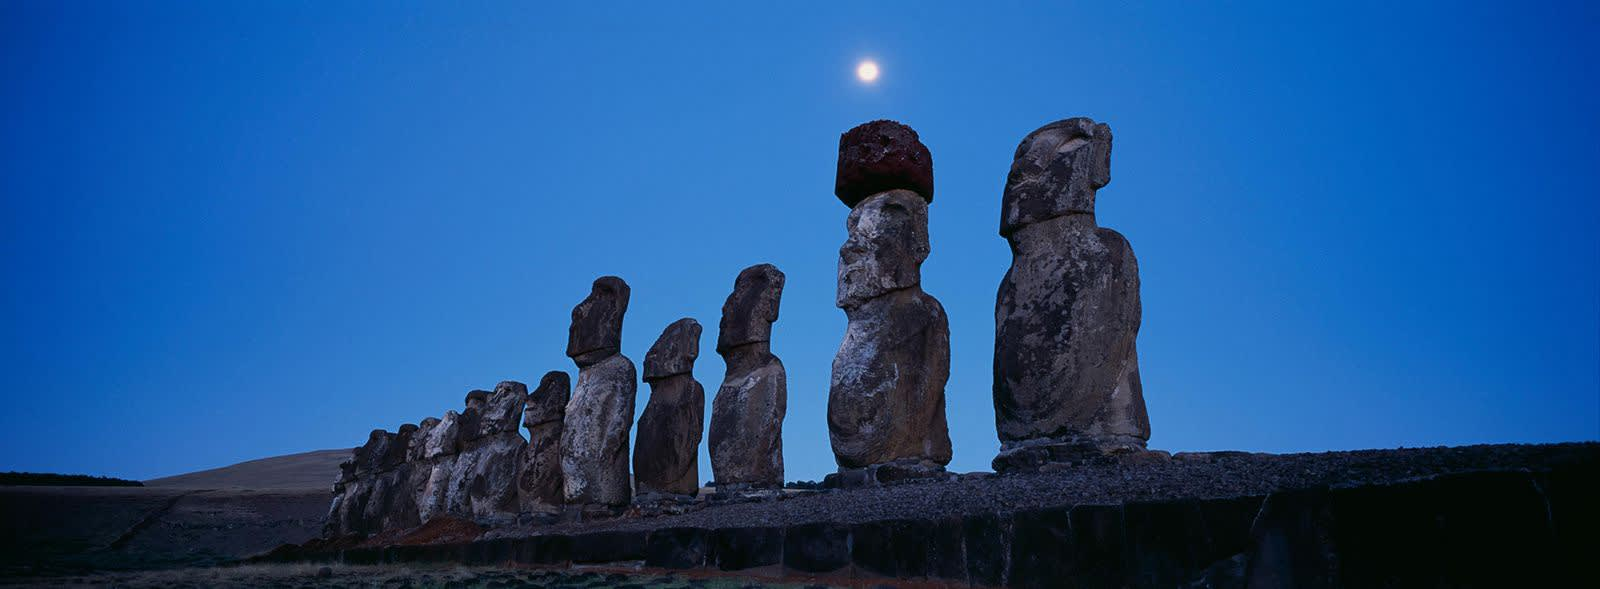 Matjaž Krivic, easter island moai